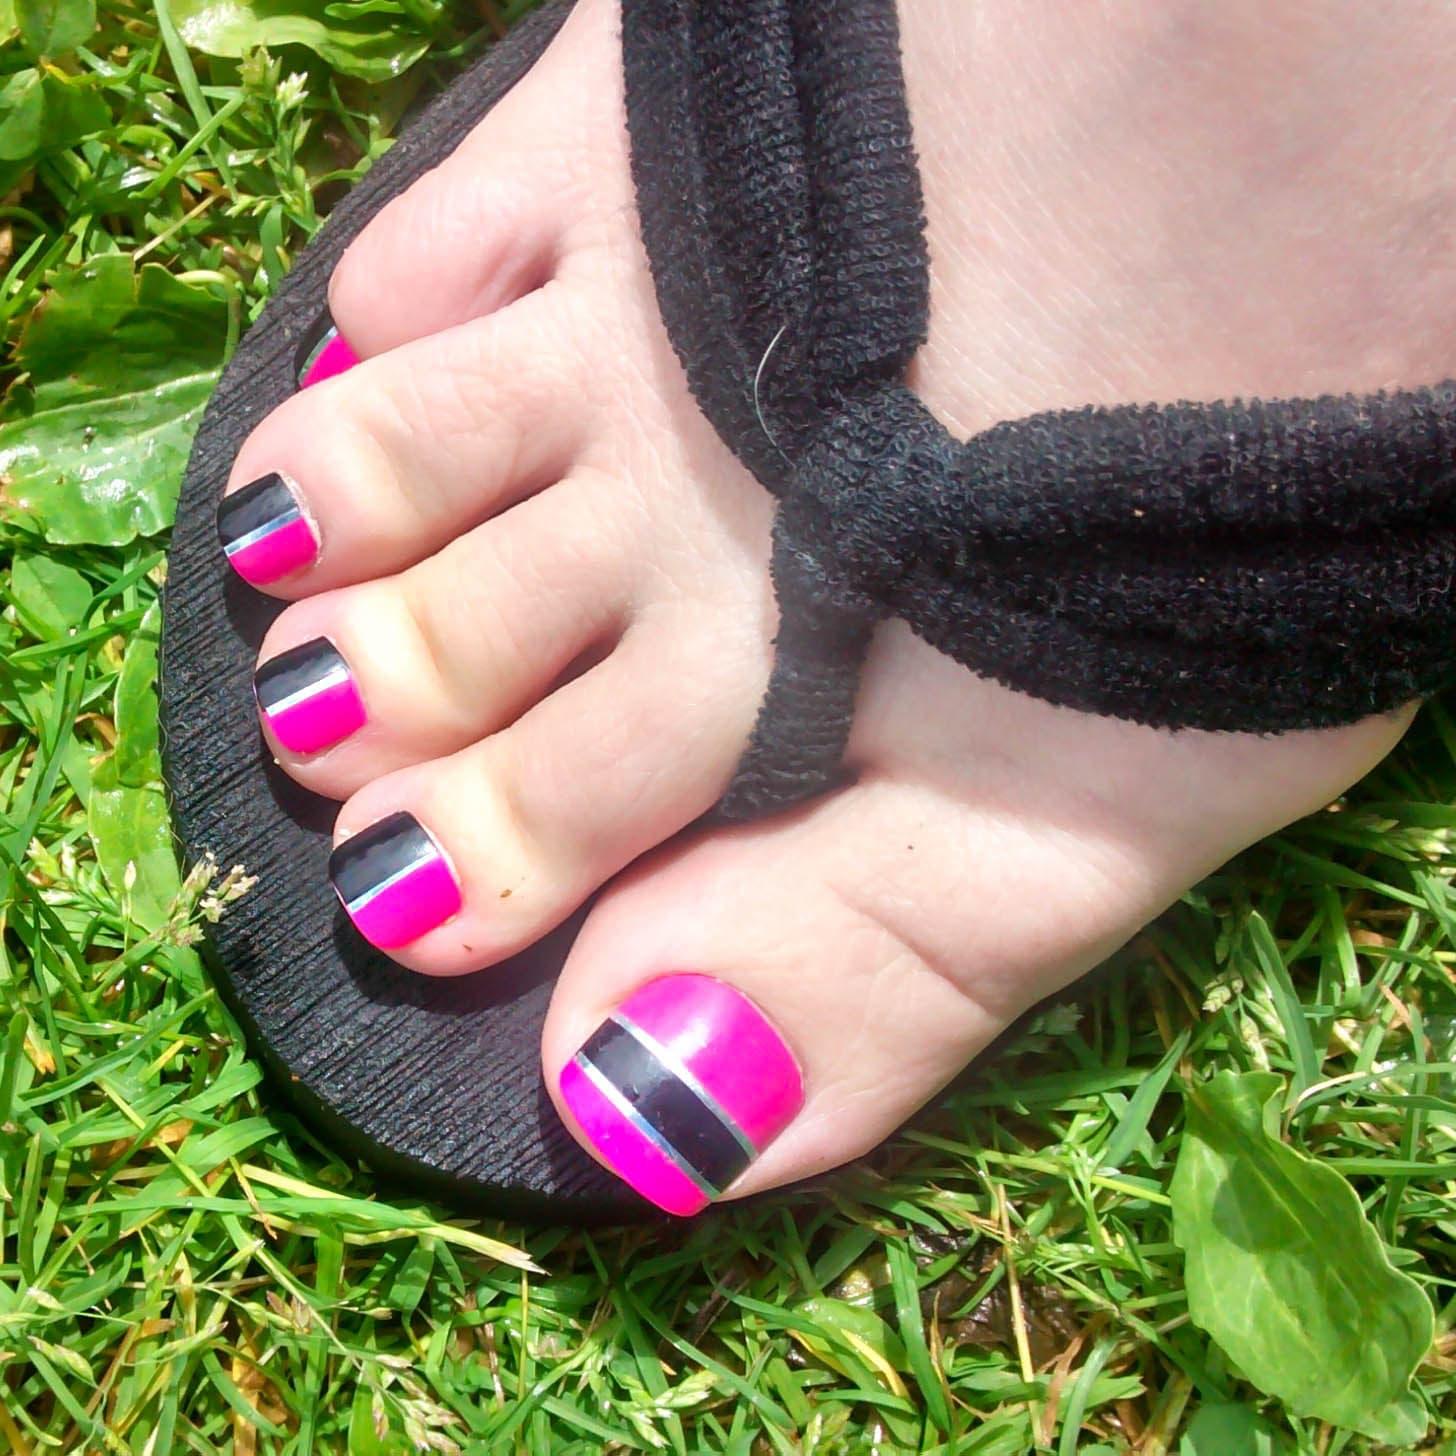 Hot Pink Fake Toenails Toenails Toe Nail Press on Acrylic